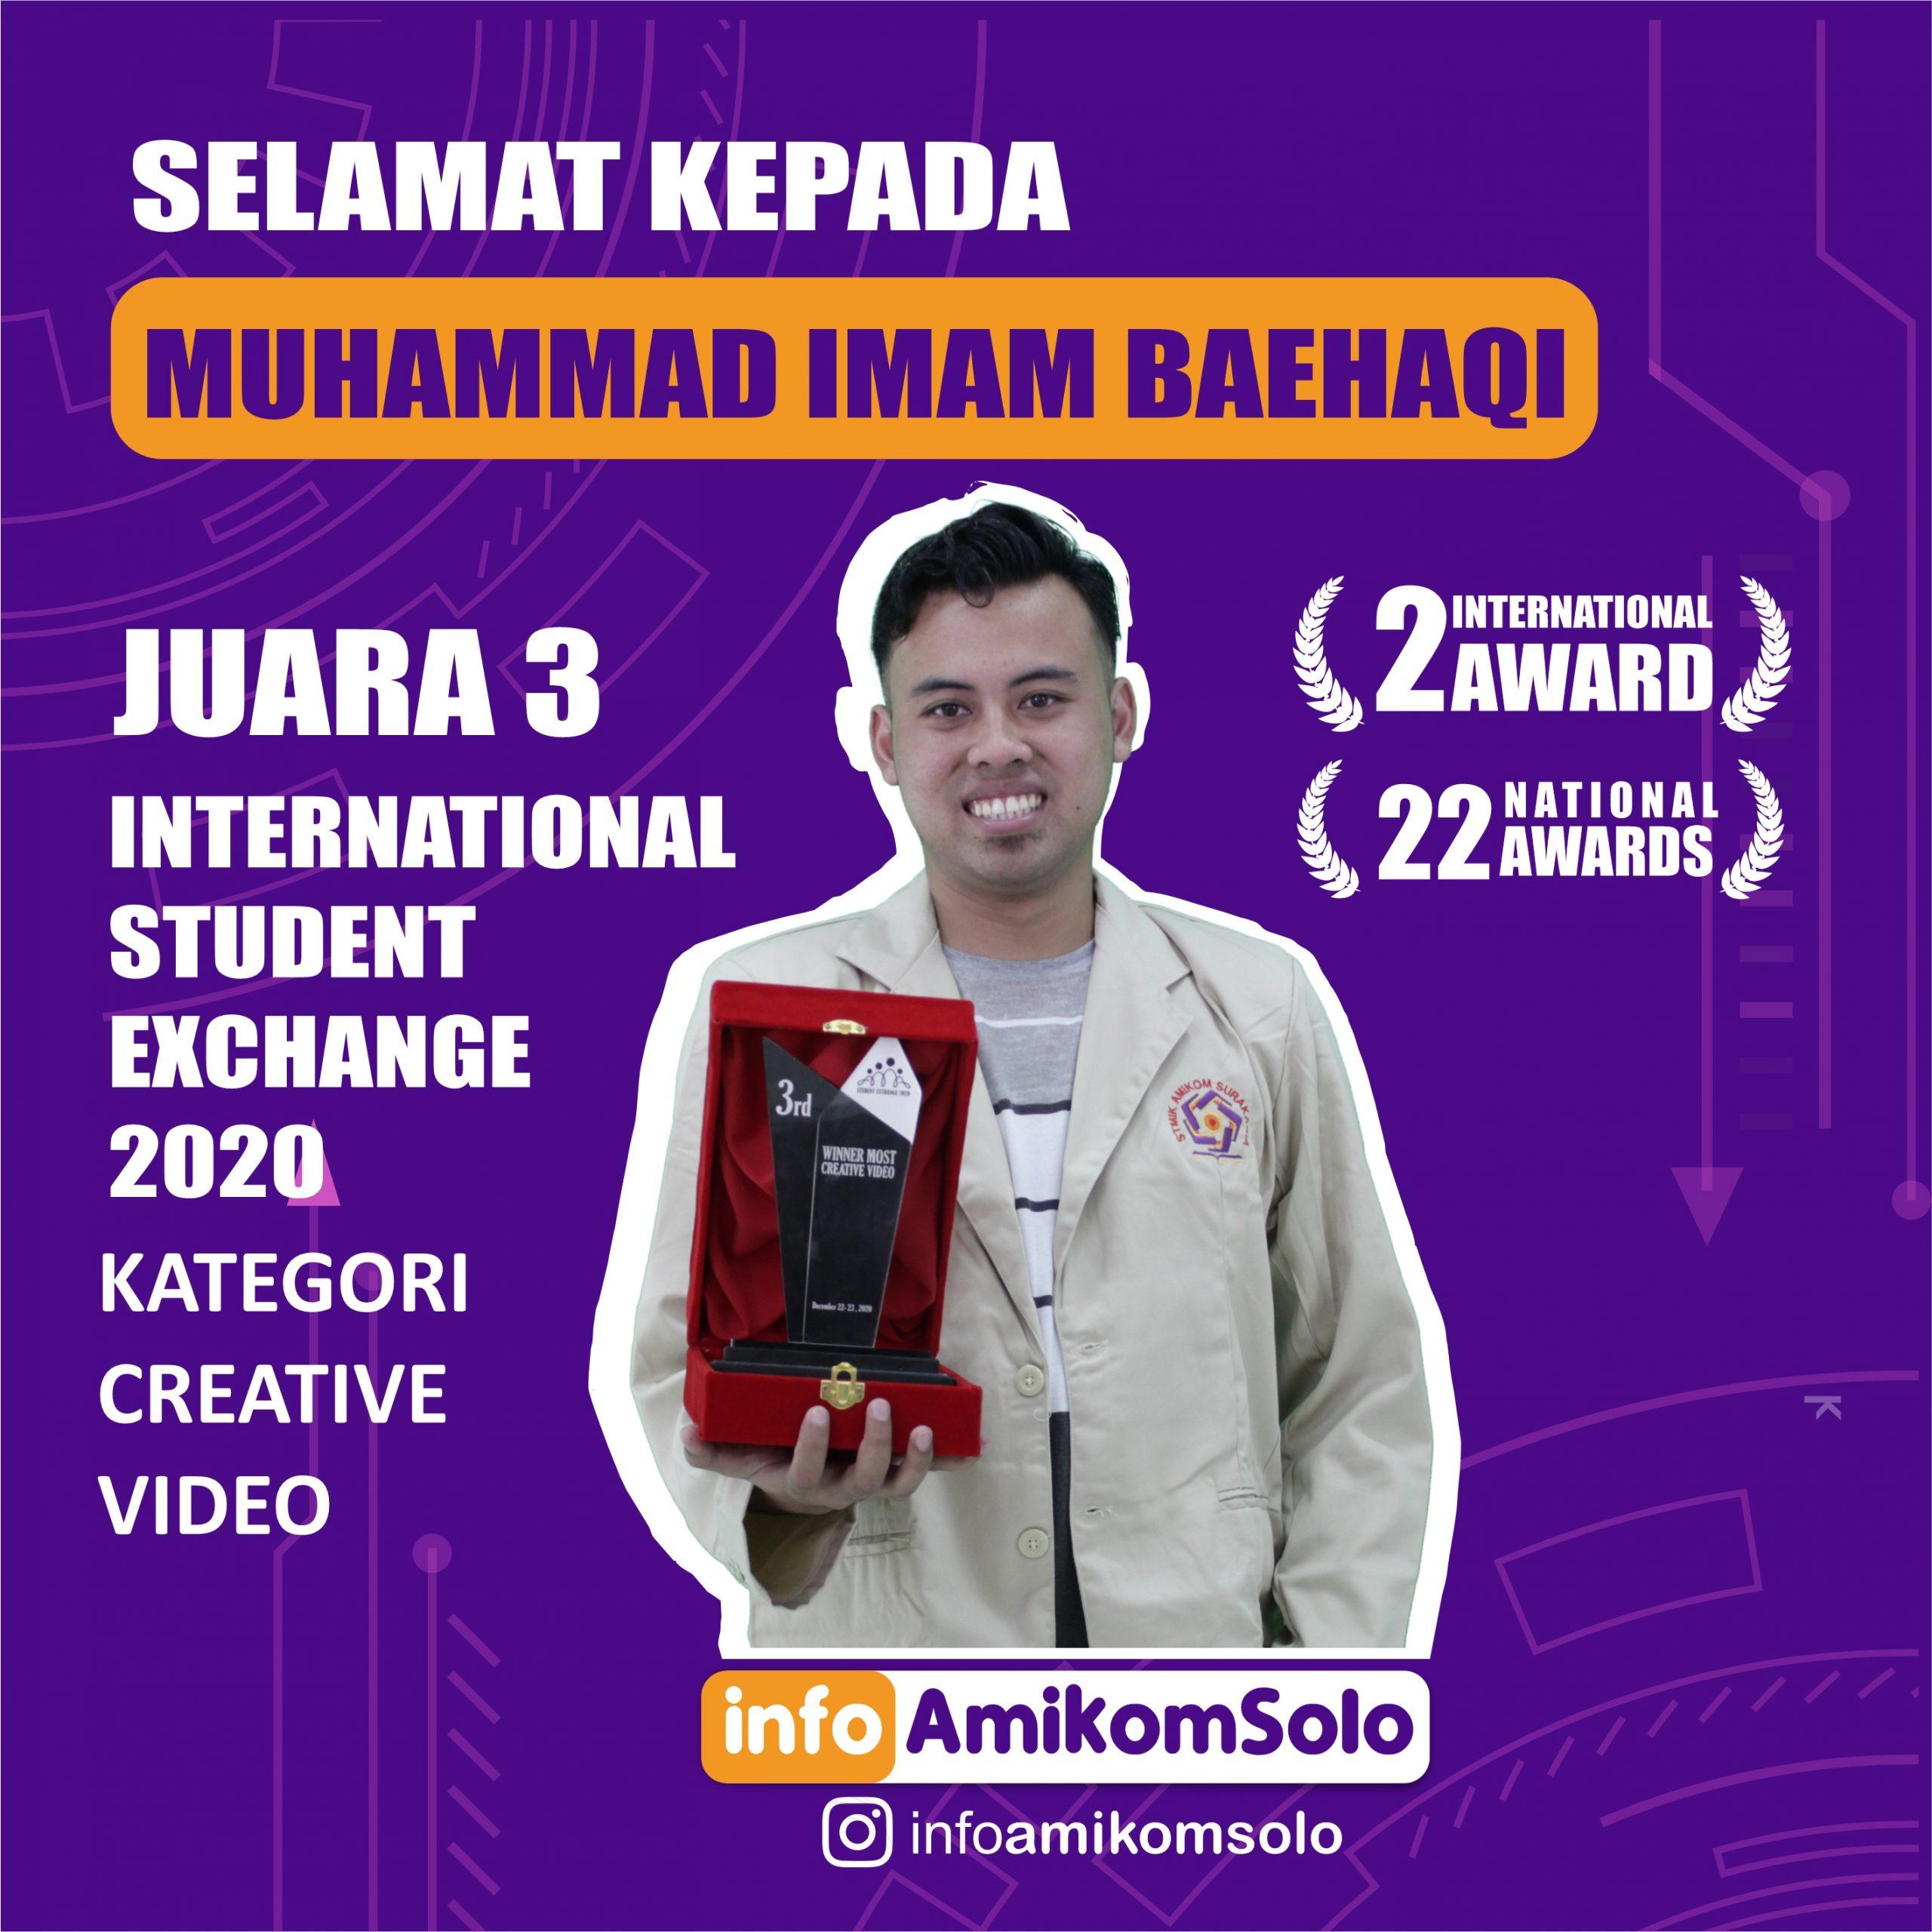 info amikomJUARA IMAM